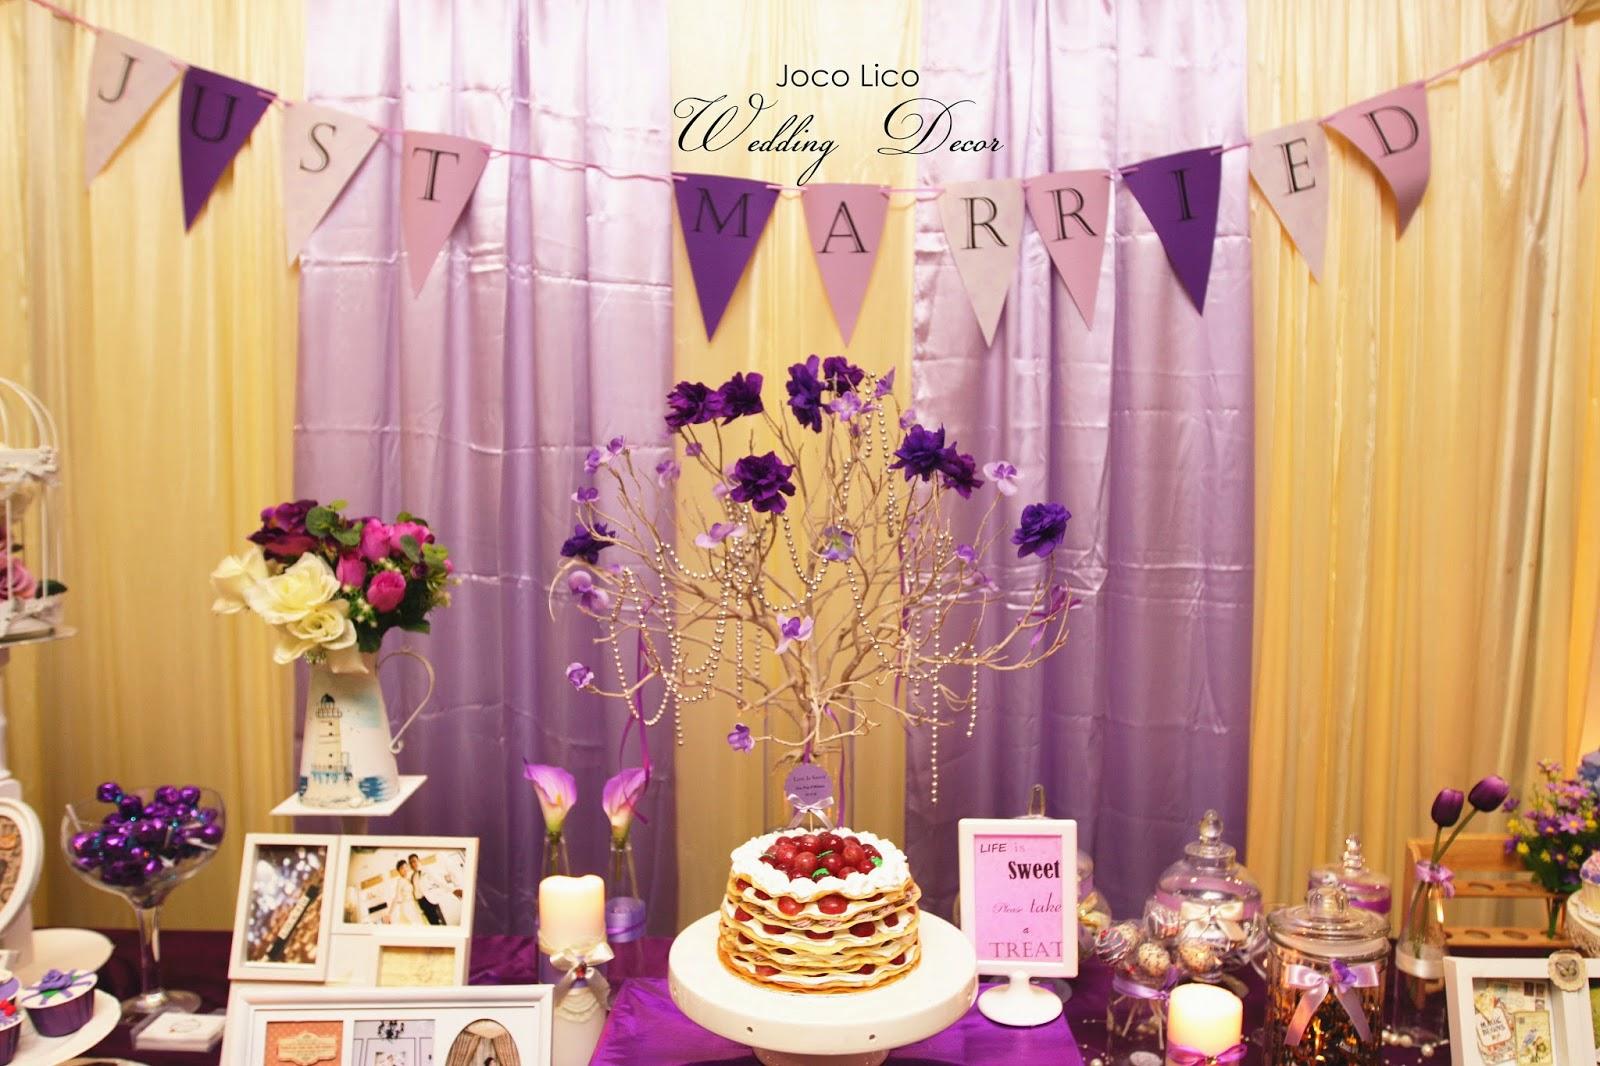 Joco lico handmade event decor purple theme wedding decor 4112014 purple theme wedding decor 4112014 junglespirit Gallery